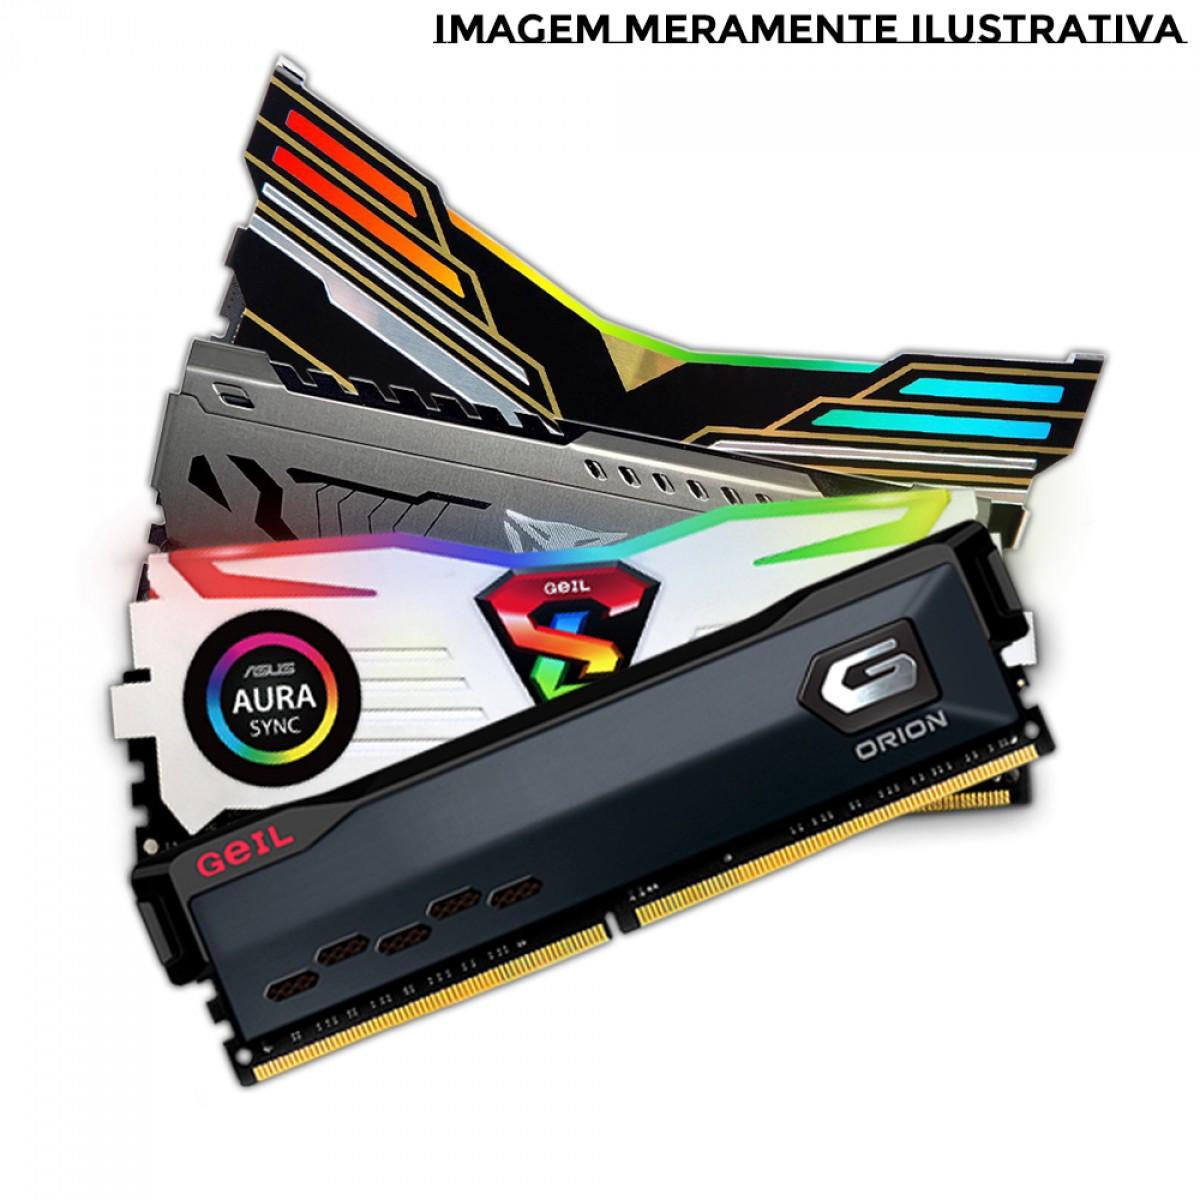 Kit Upgrade, ASUS Prime B550M-K + AMD Ryzen 7 5700G + Memória DDR4, 16GB 3000MHz